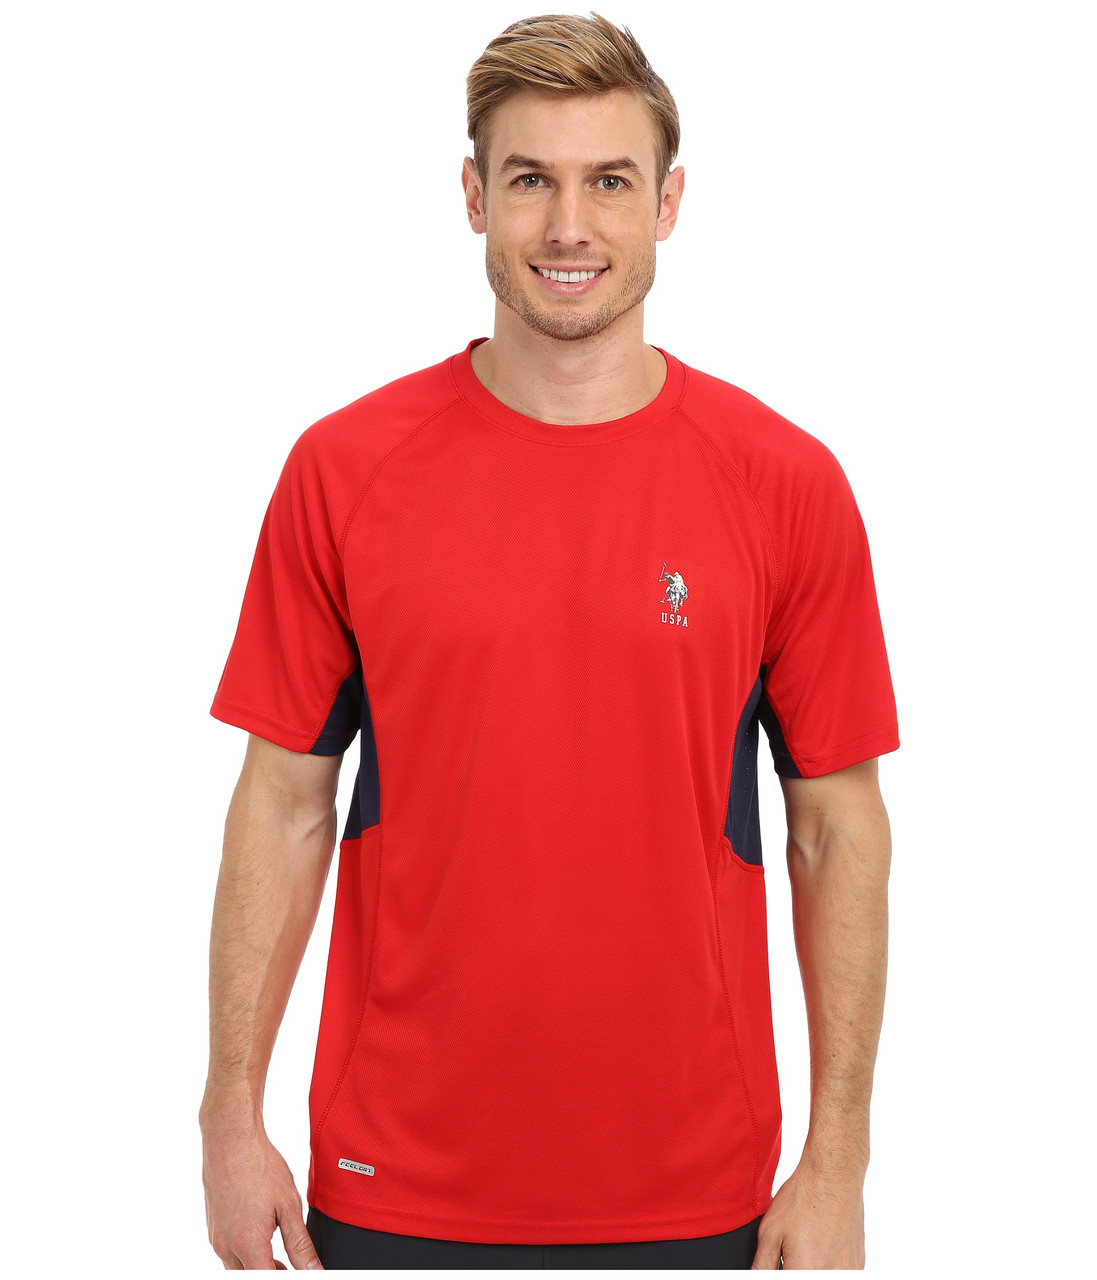 Футболка спортивная U.S. POLO ASSN., Engine Red